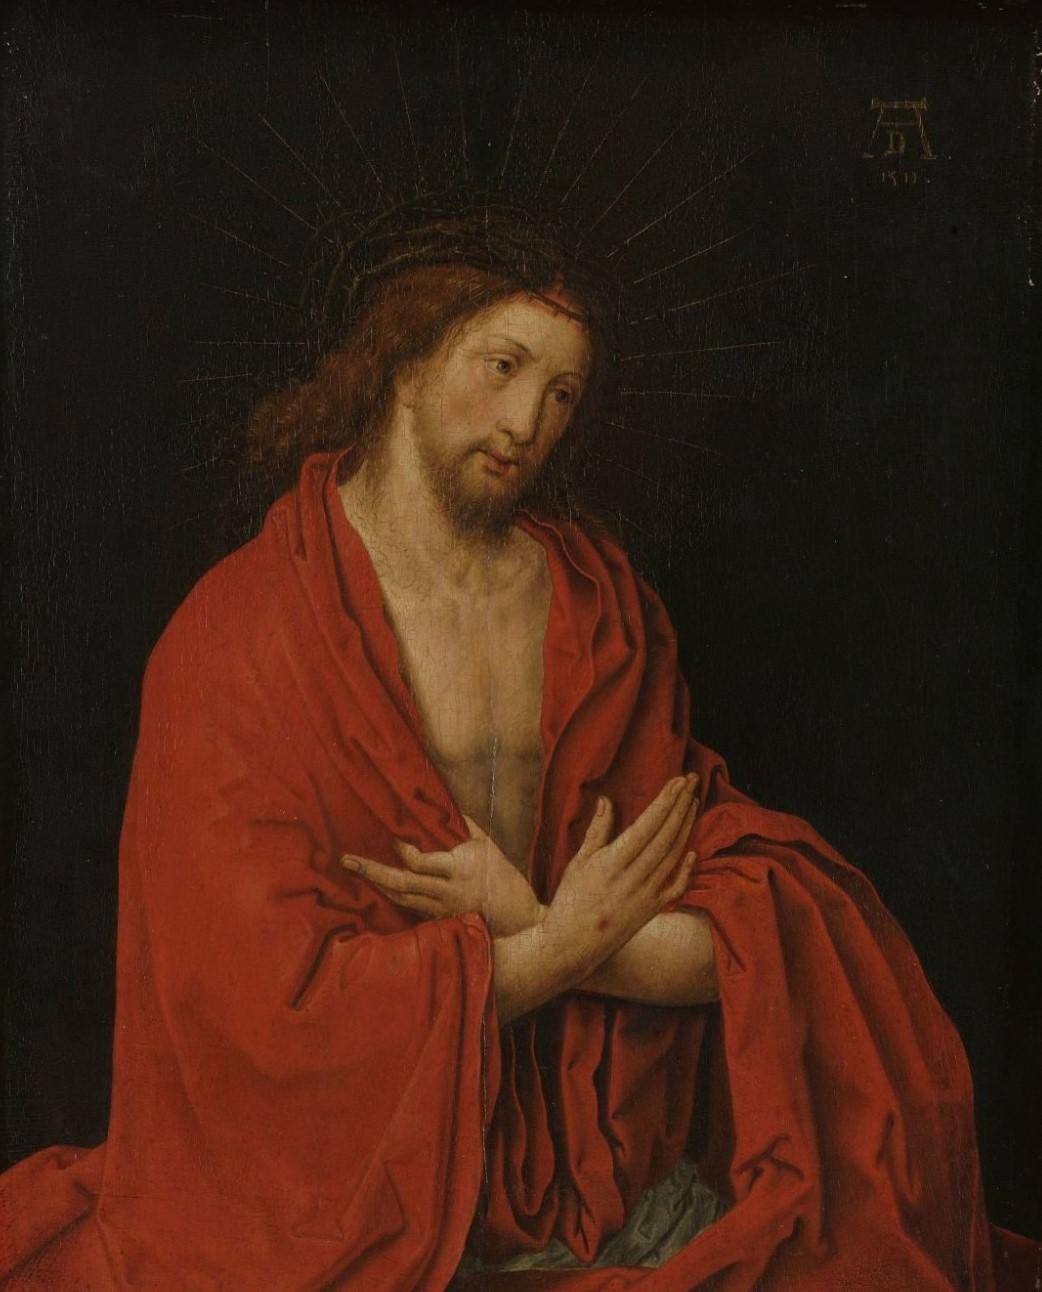 1522 ca copy after Lucas van Leyden, Christ as the Man of Sorrows, 1557-1600 Rijksmuseum